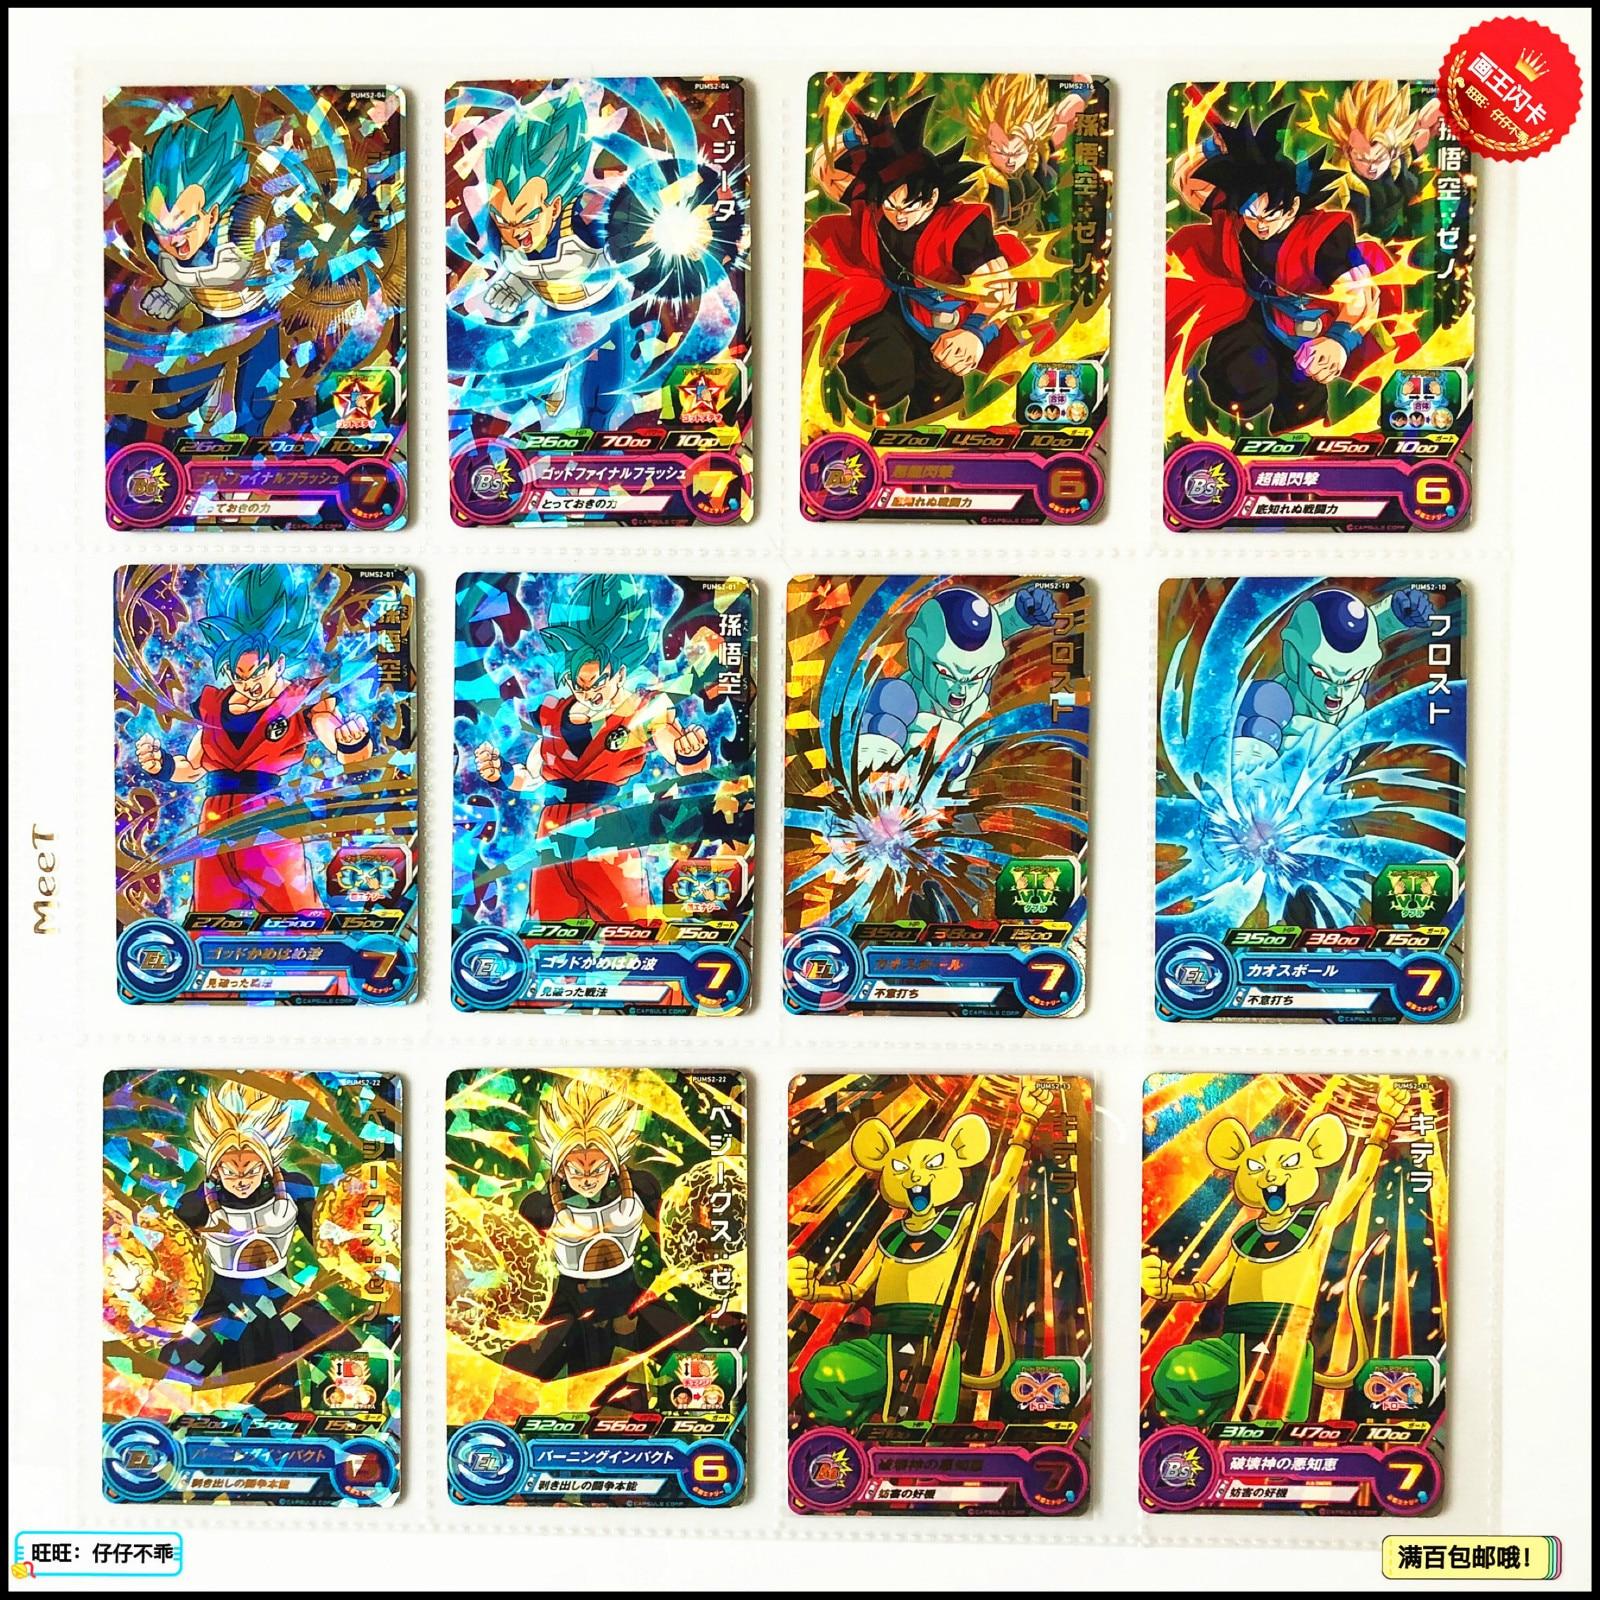 Japan Original Dragon Ball Hero Card PUMS2 Goku Toys Hobbies Collectibles Game Collection Anime Cards